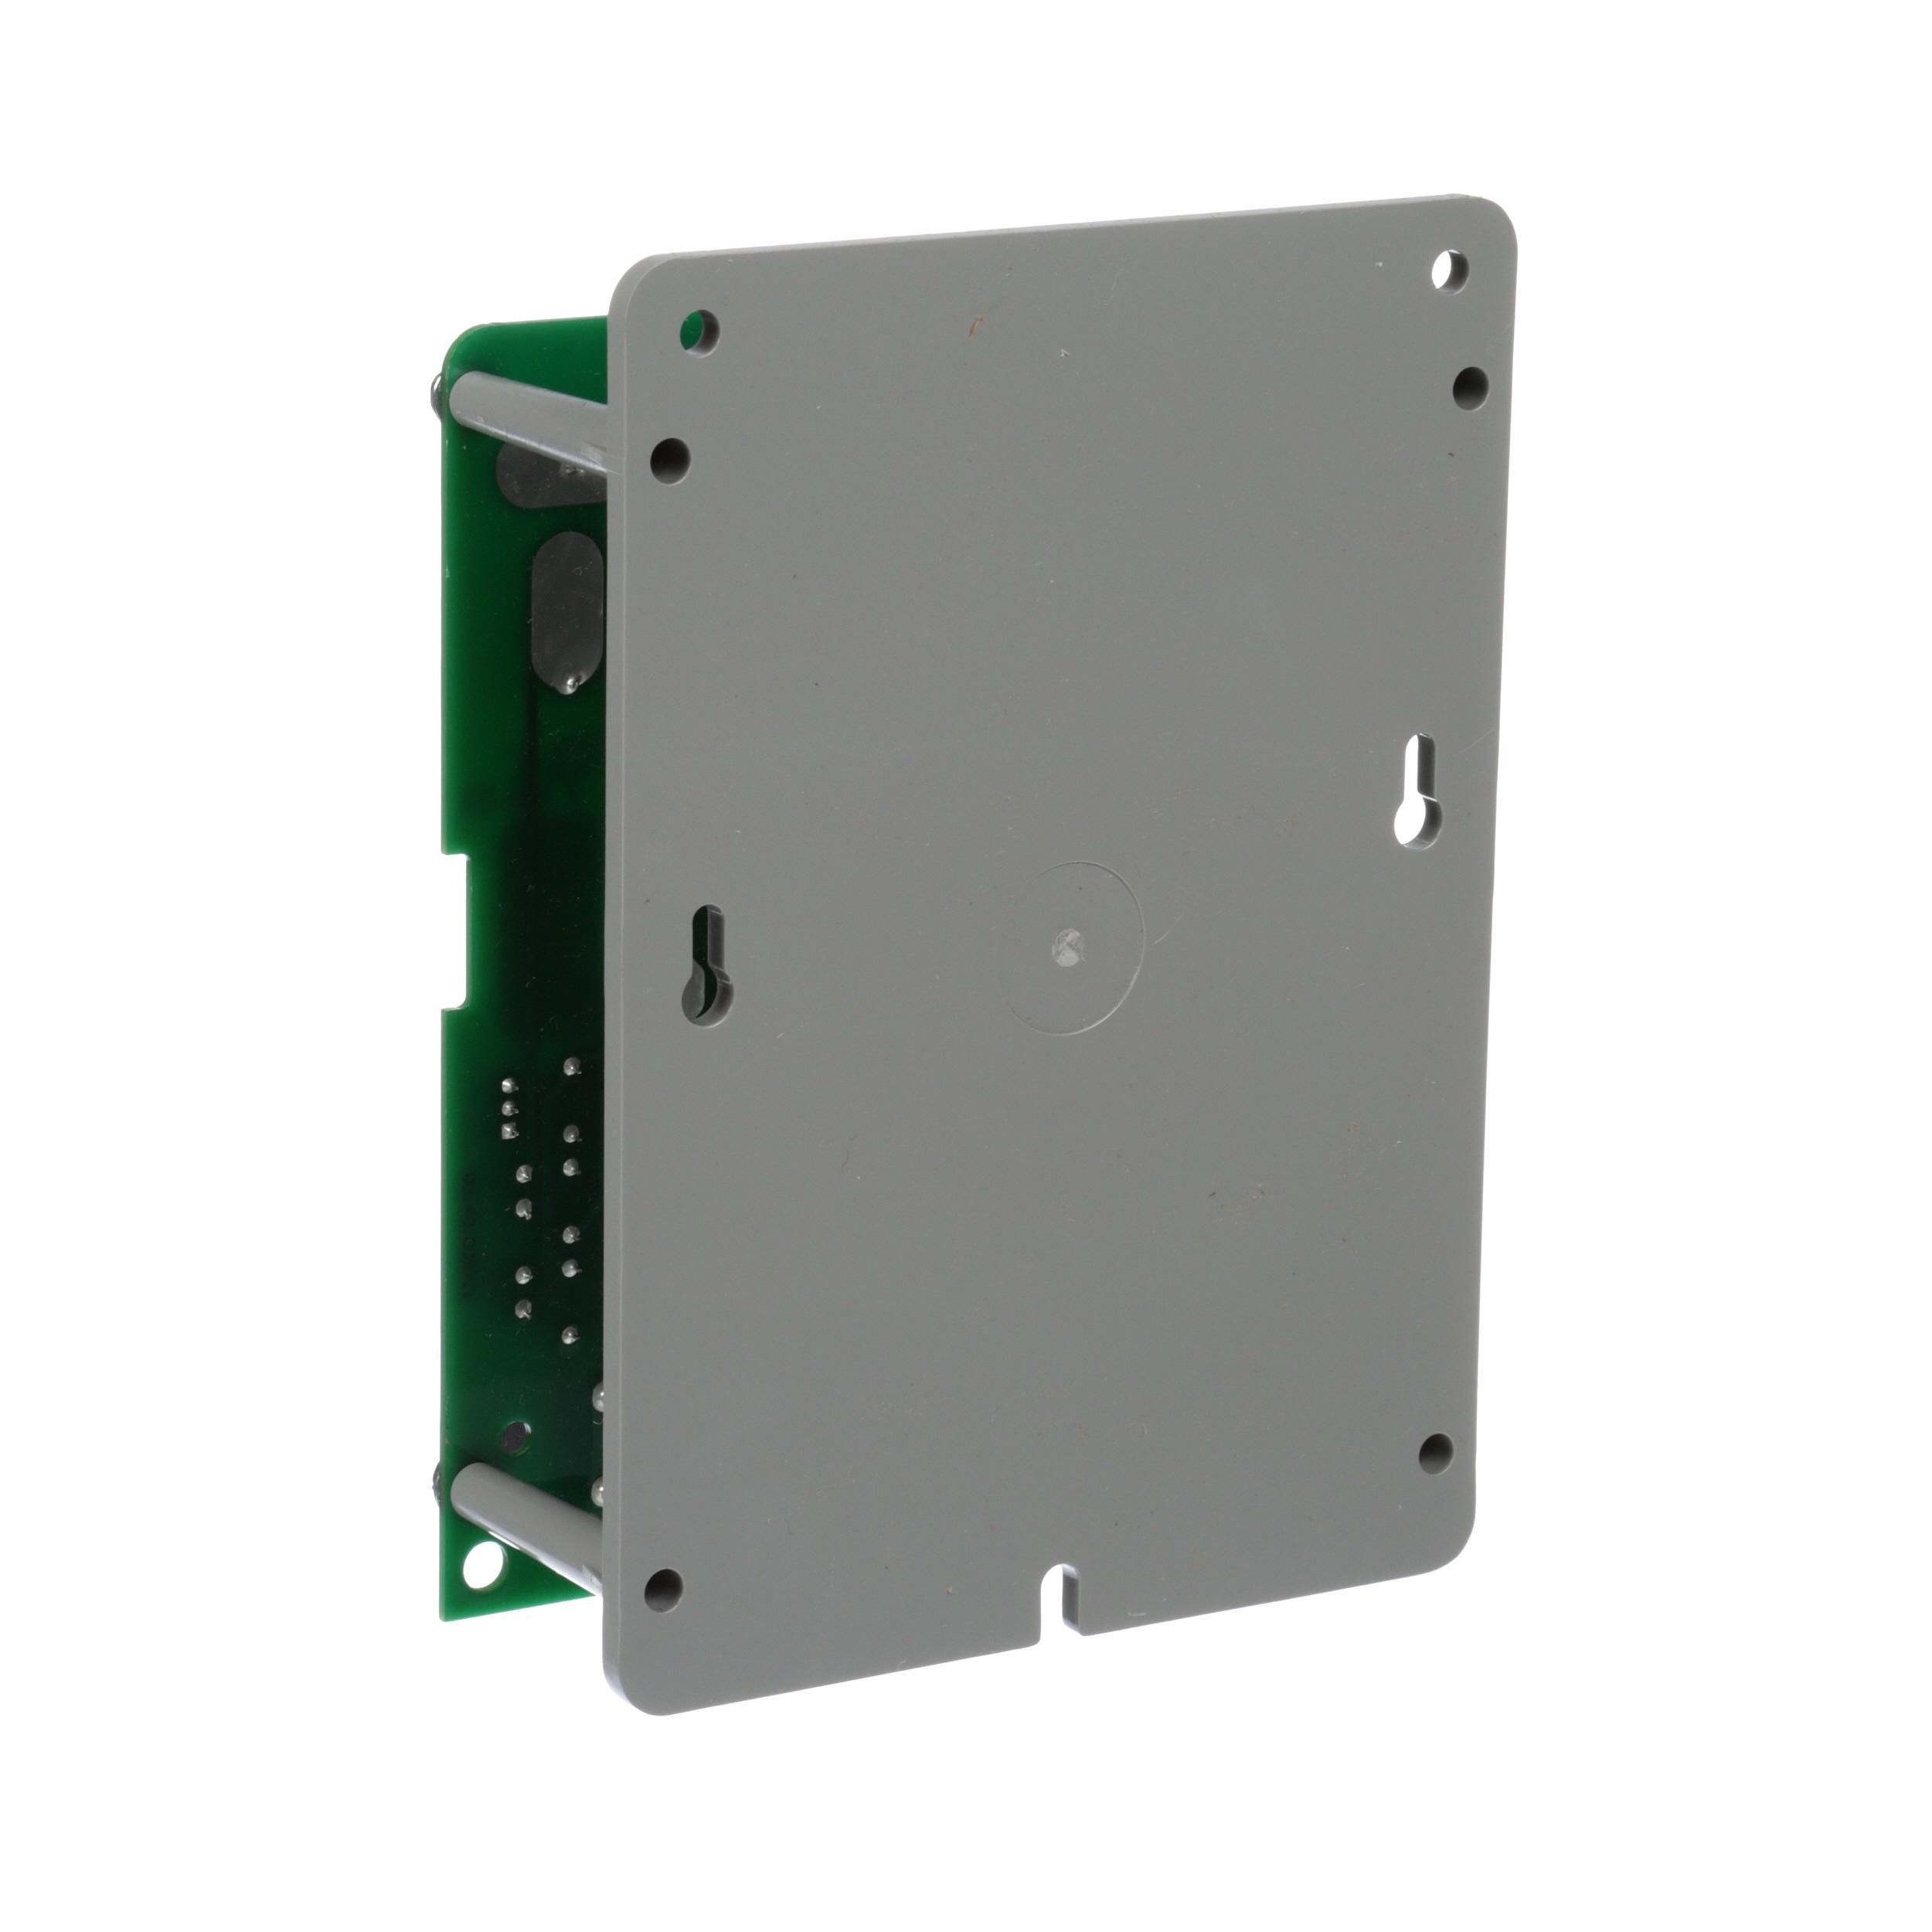 small resolution of warren immersion heater wiring diagram infrared heater wiring 264863 r01 c09 w 300